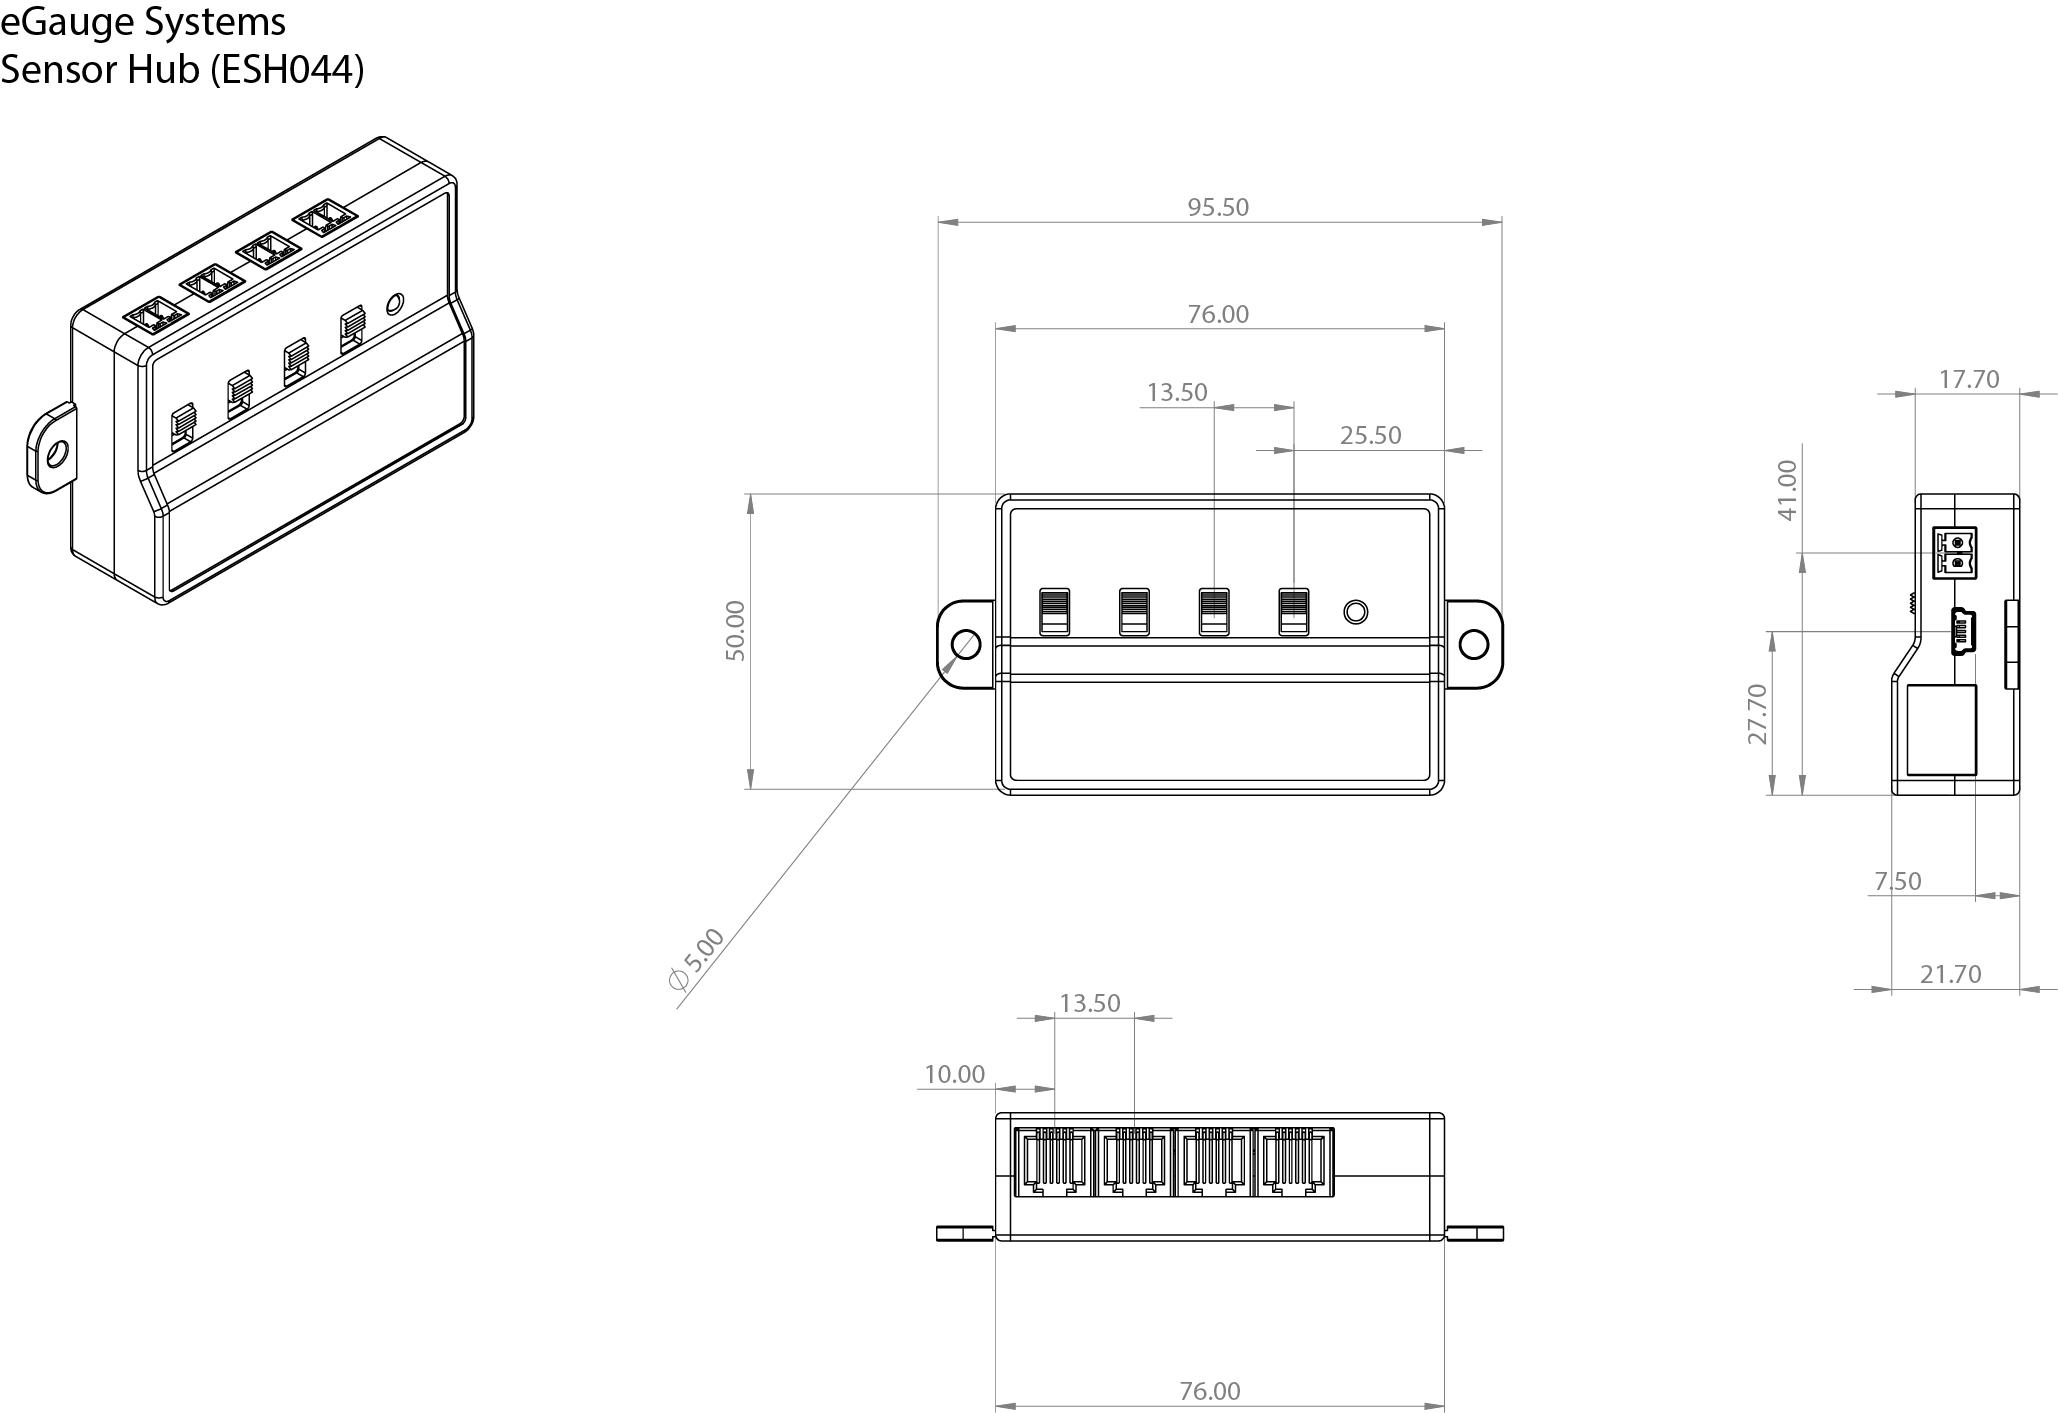 Sensor-Hub-Drawing.png